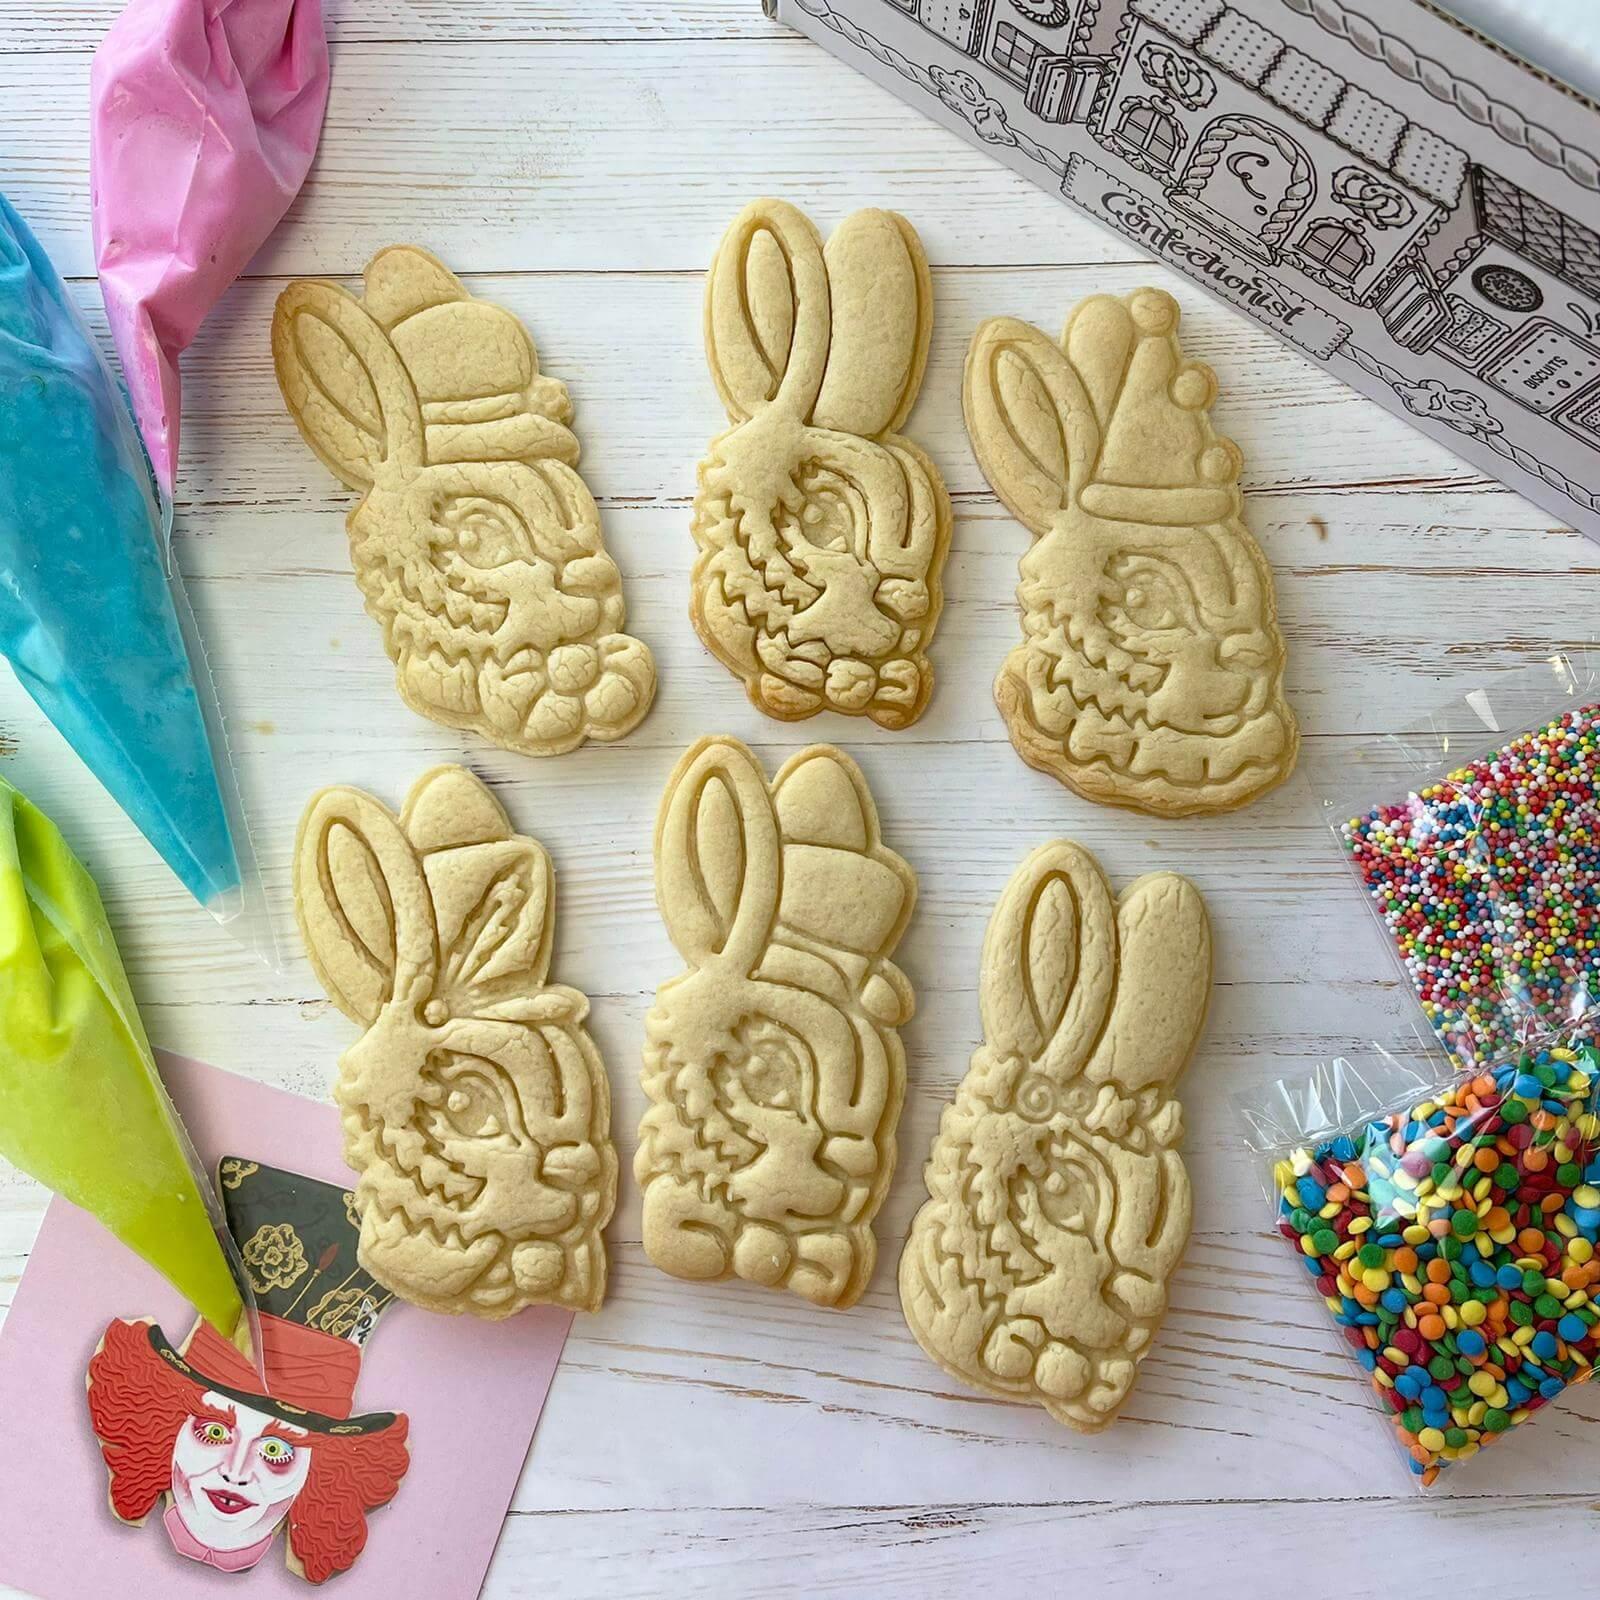 DIY Decorating Kit for Easter Bunny